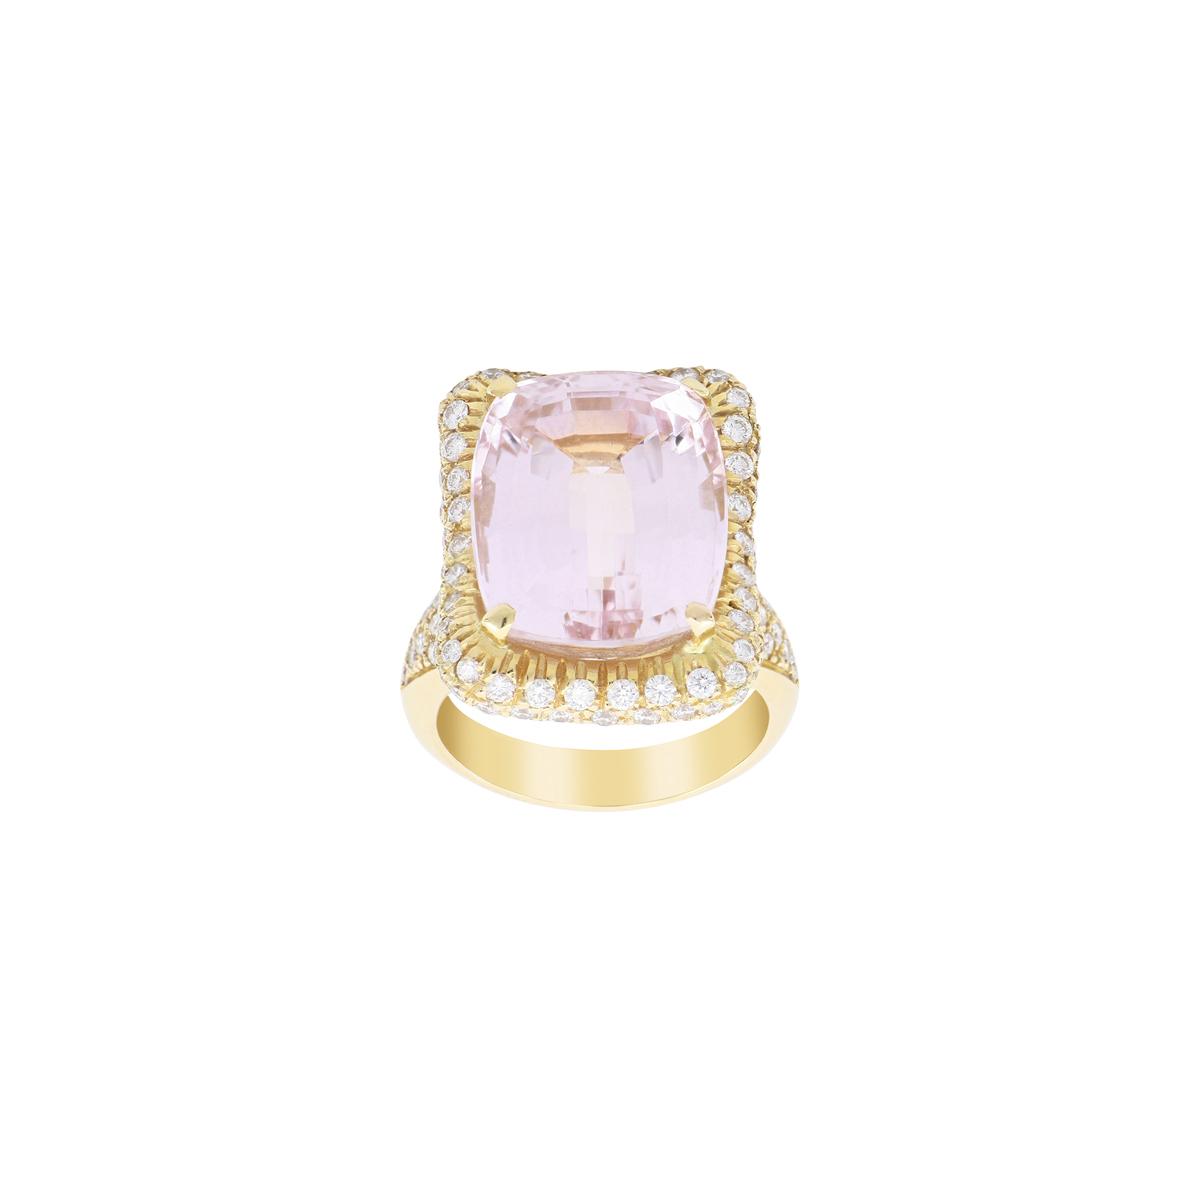 Kunzite Ring with Double Diamond Halo